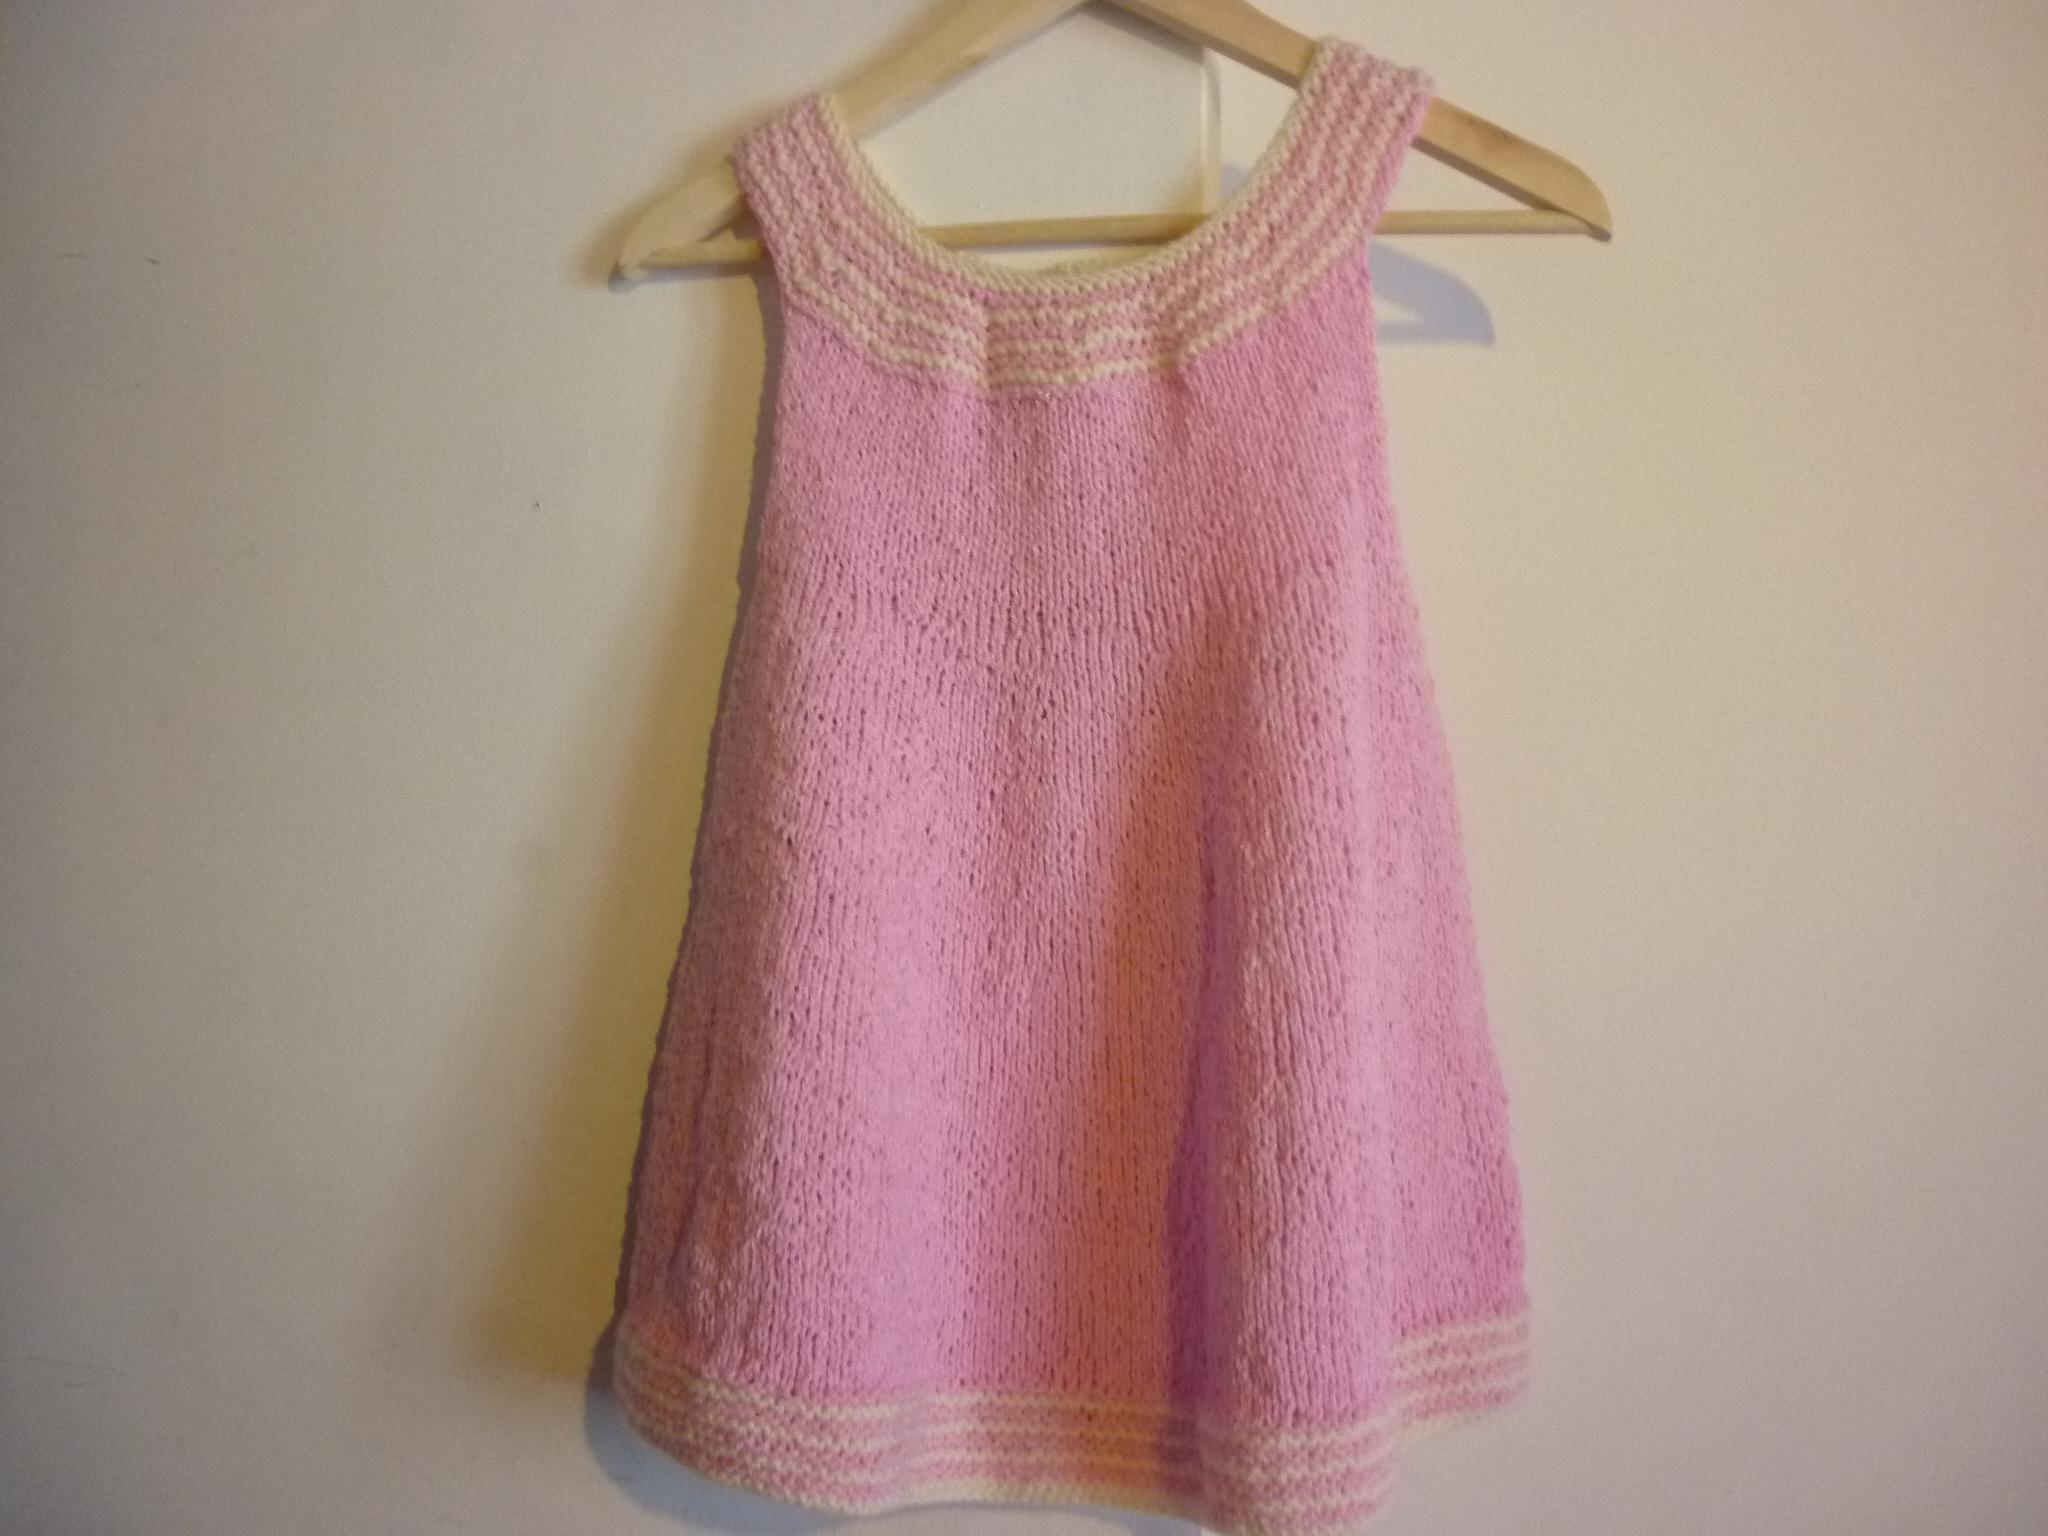 Tuto robe laine fille